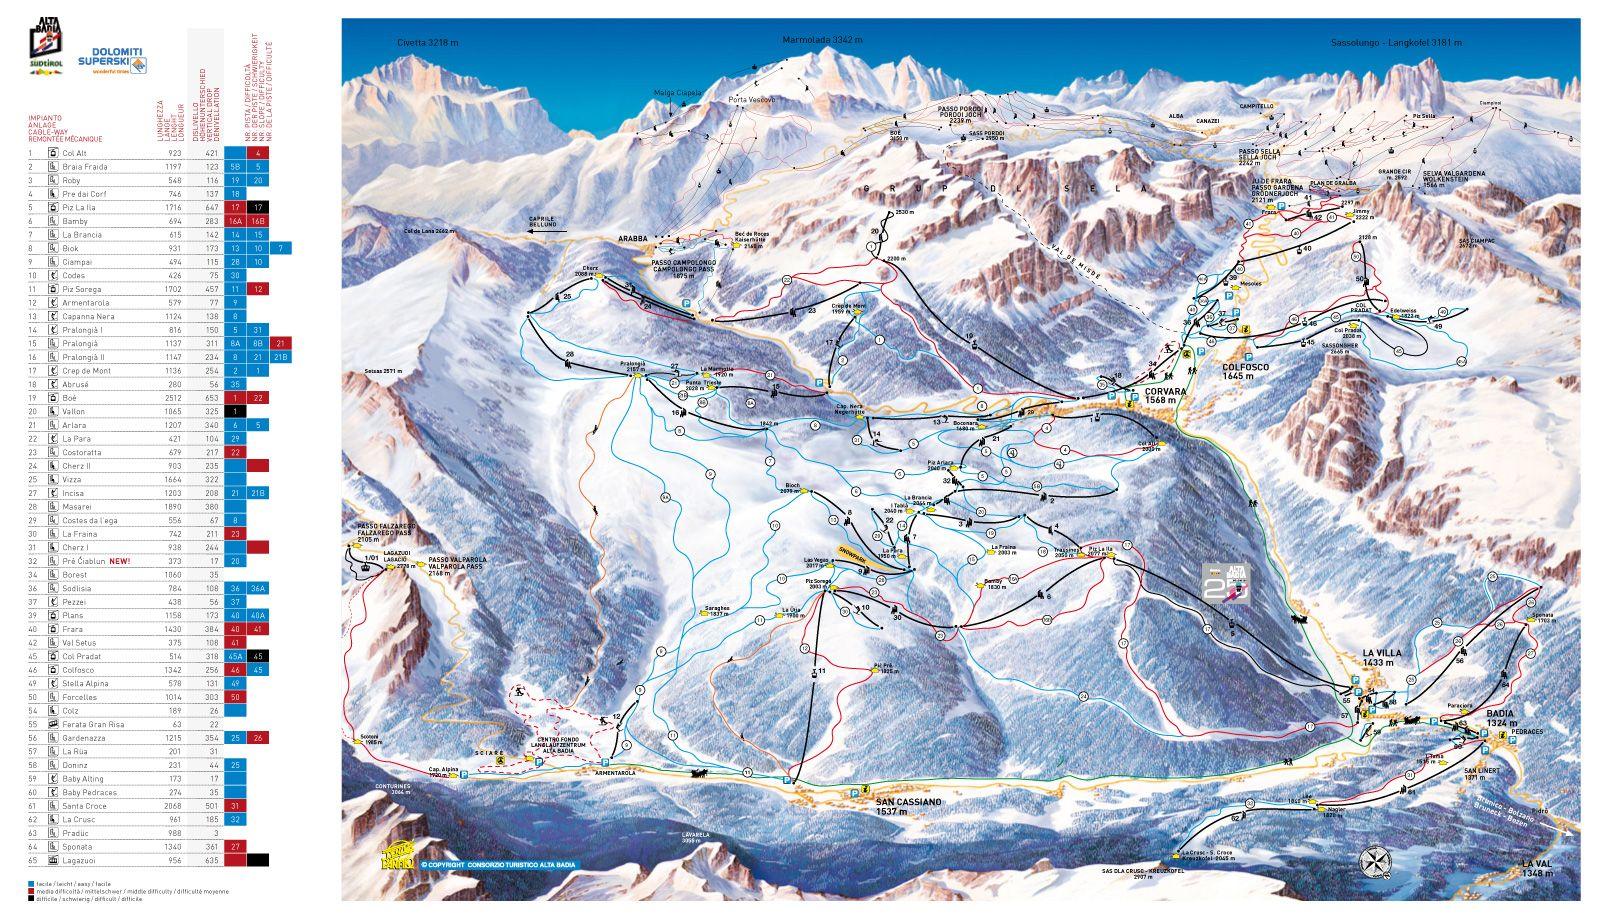 AltaBadiaPisteMap South Tyrol Pinterest South tyrol